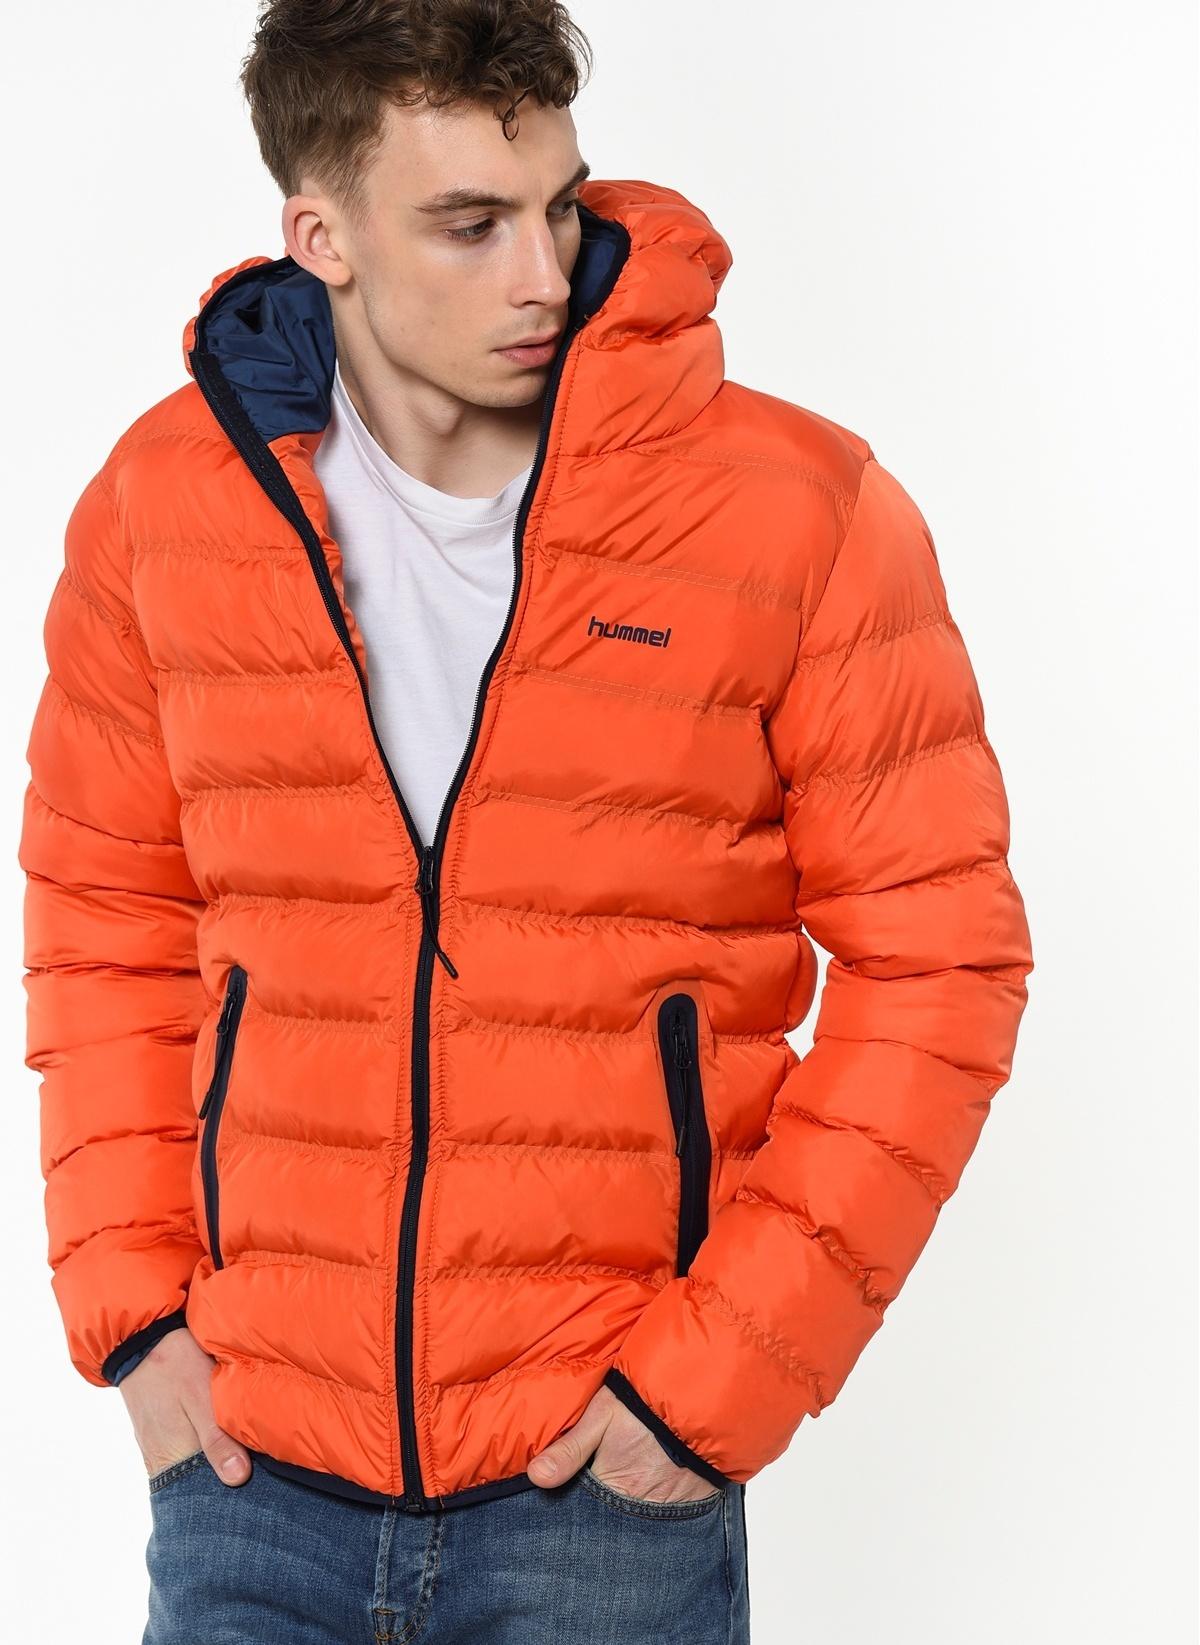 Hummel Mont 940012-5011 Hmlfronzal Jacket – 259.95 TL